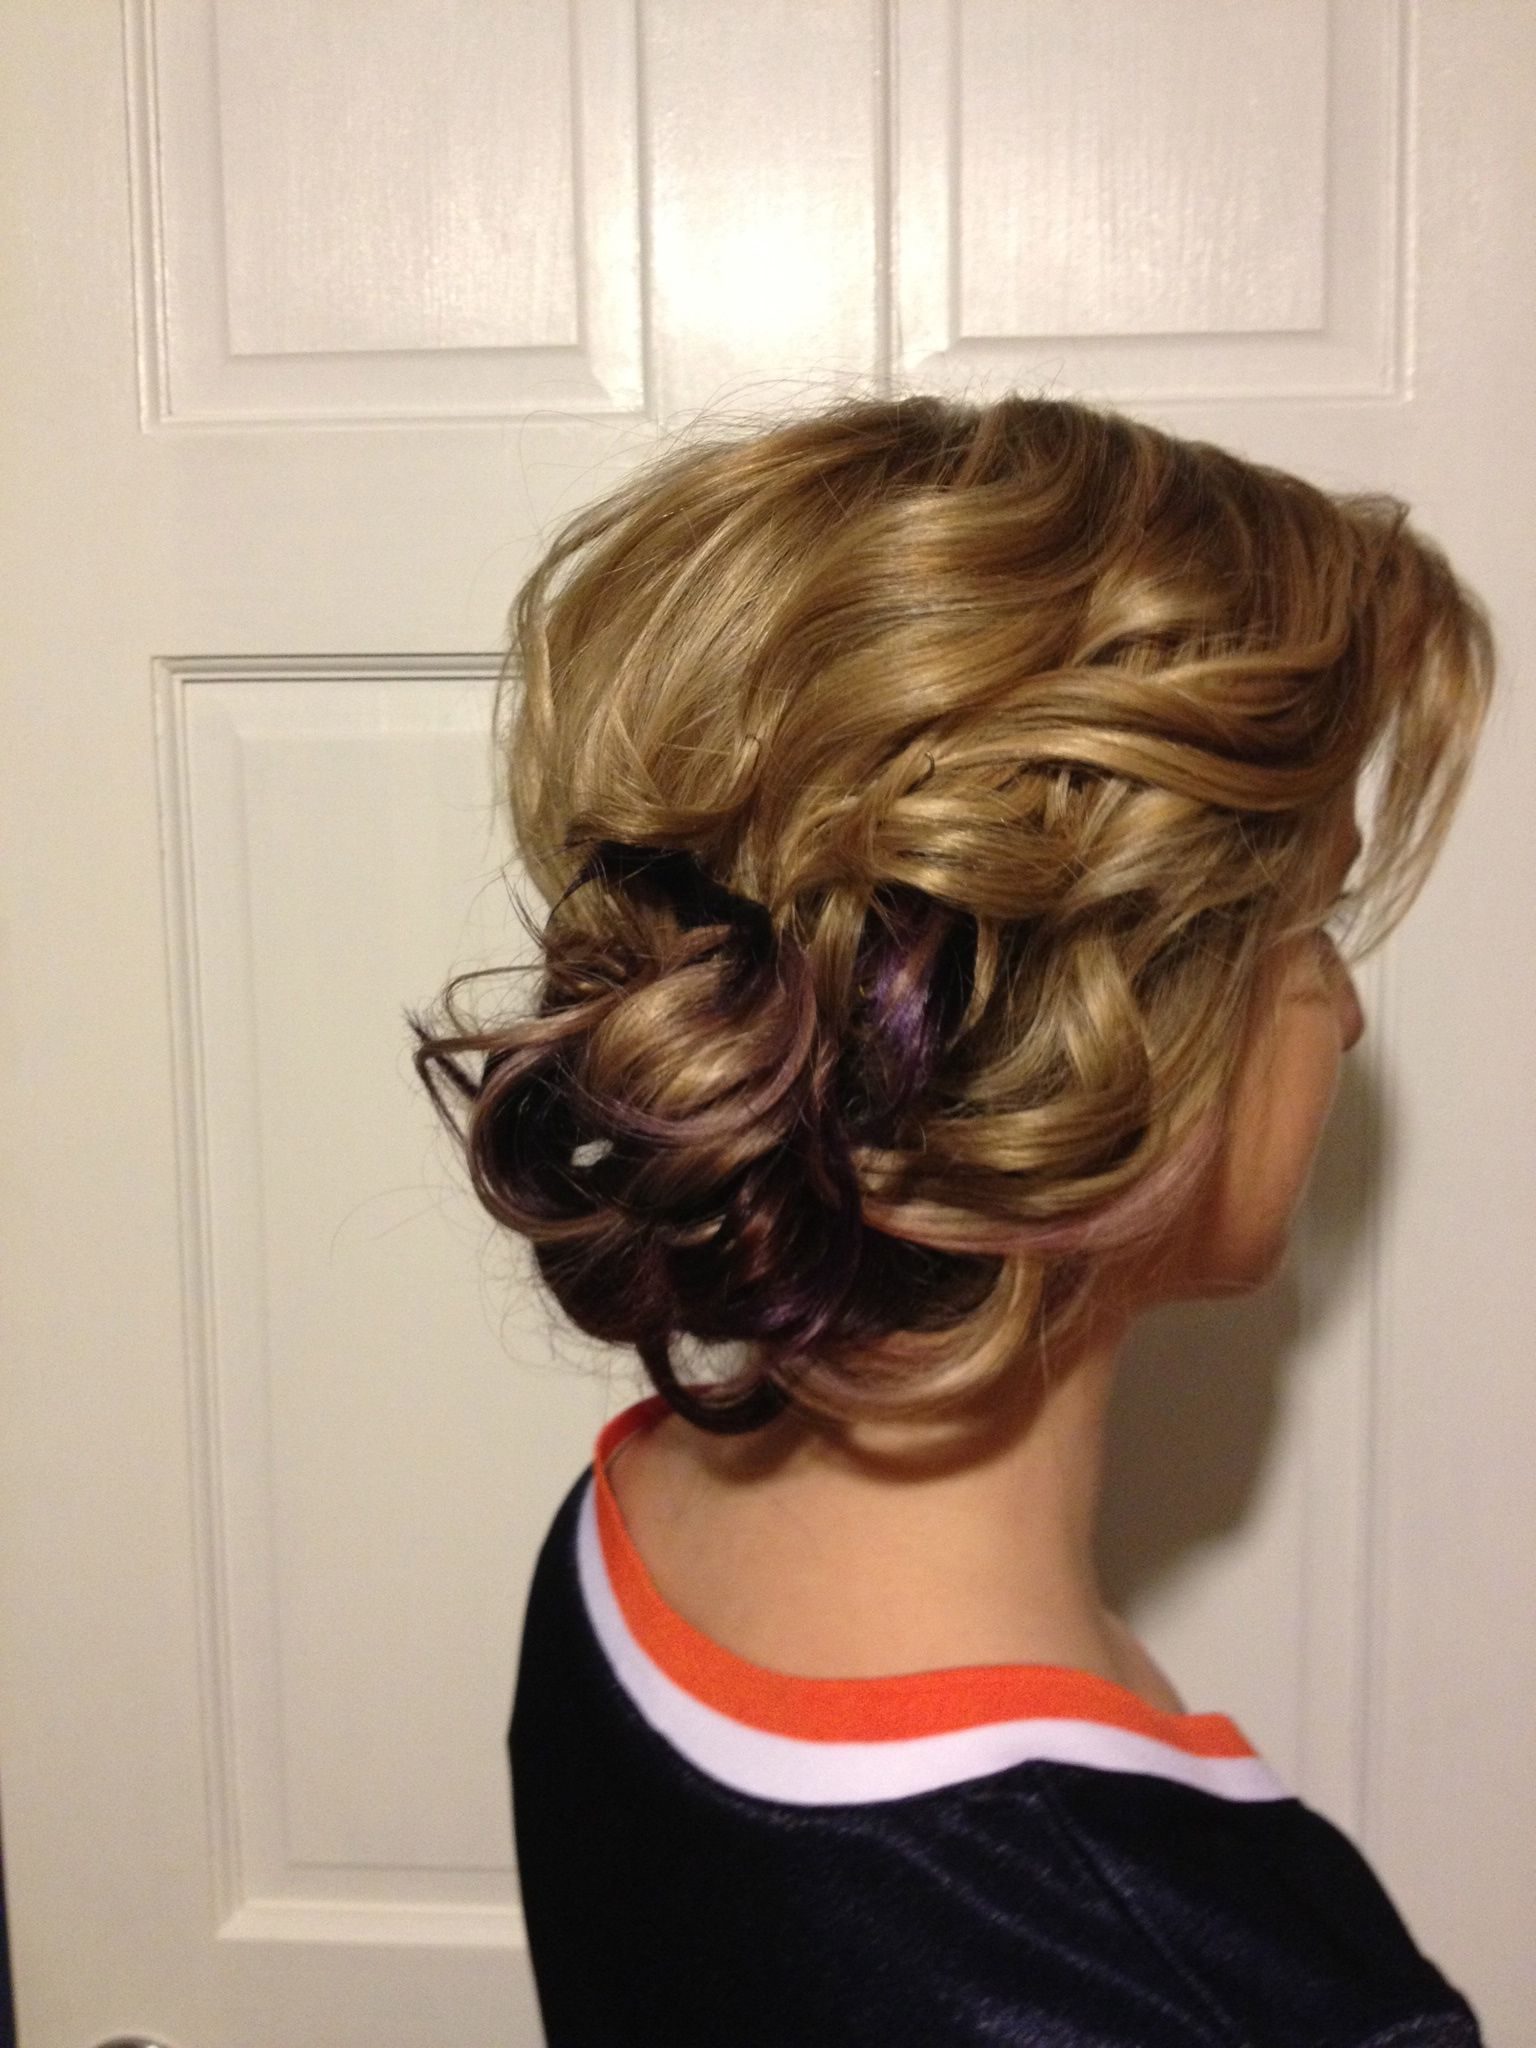 Pin by Lacey Quinn on Hair | Hair styles, Short hair updo ...